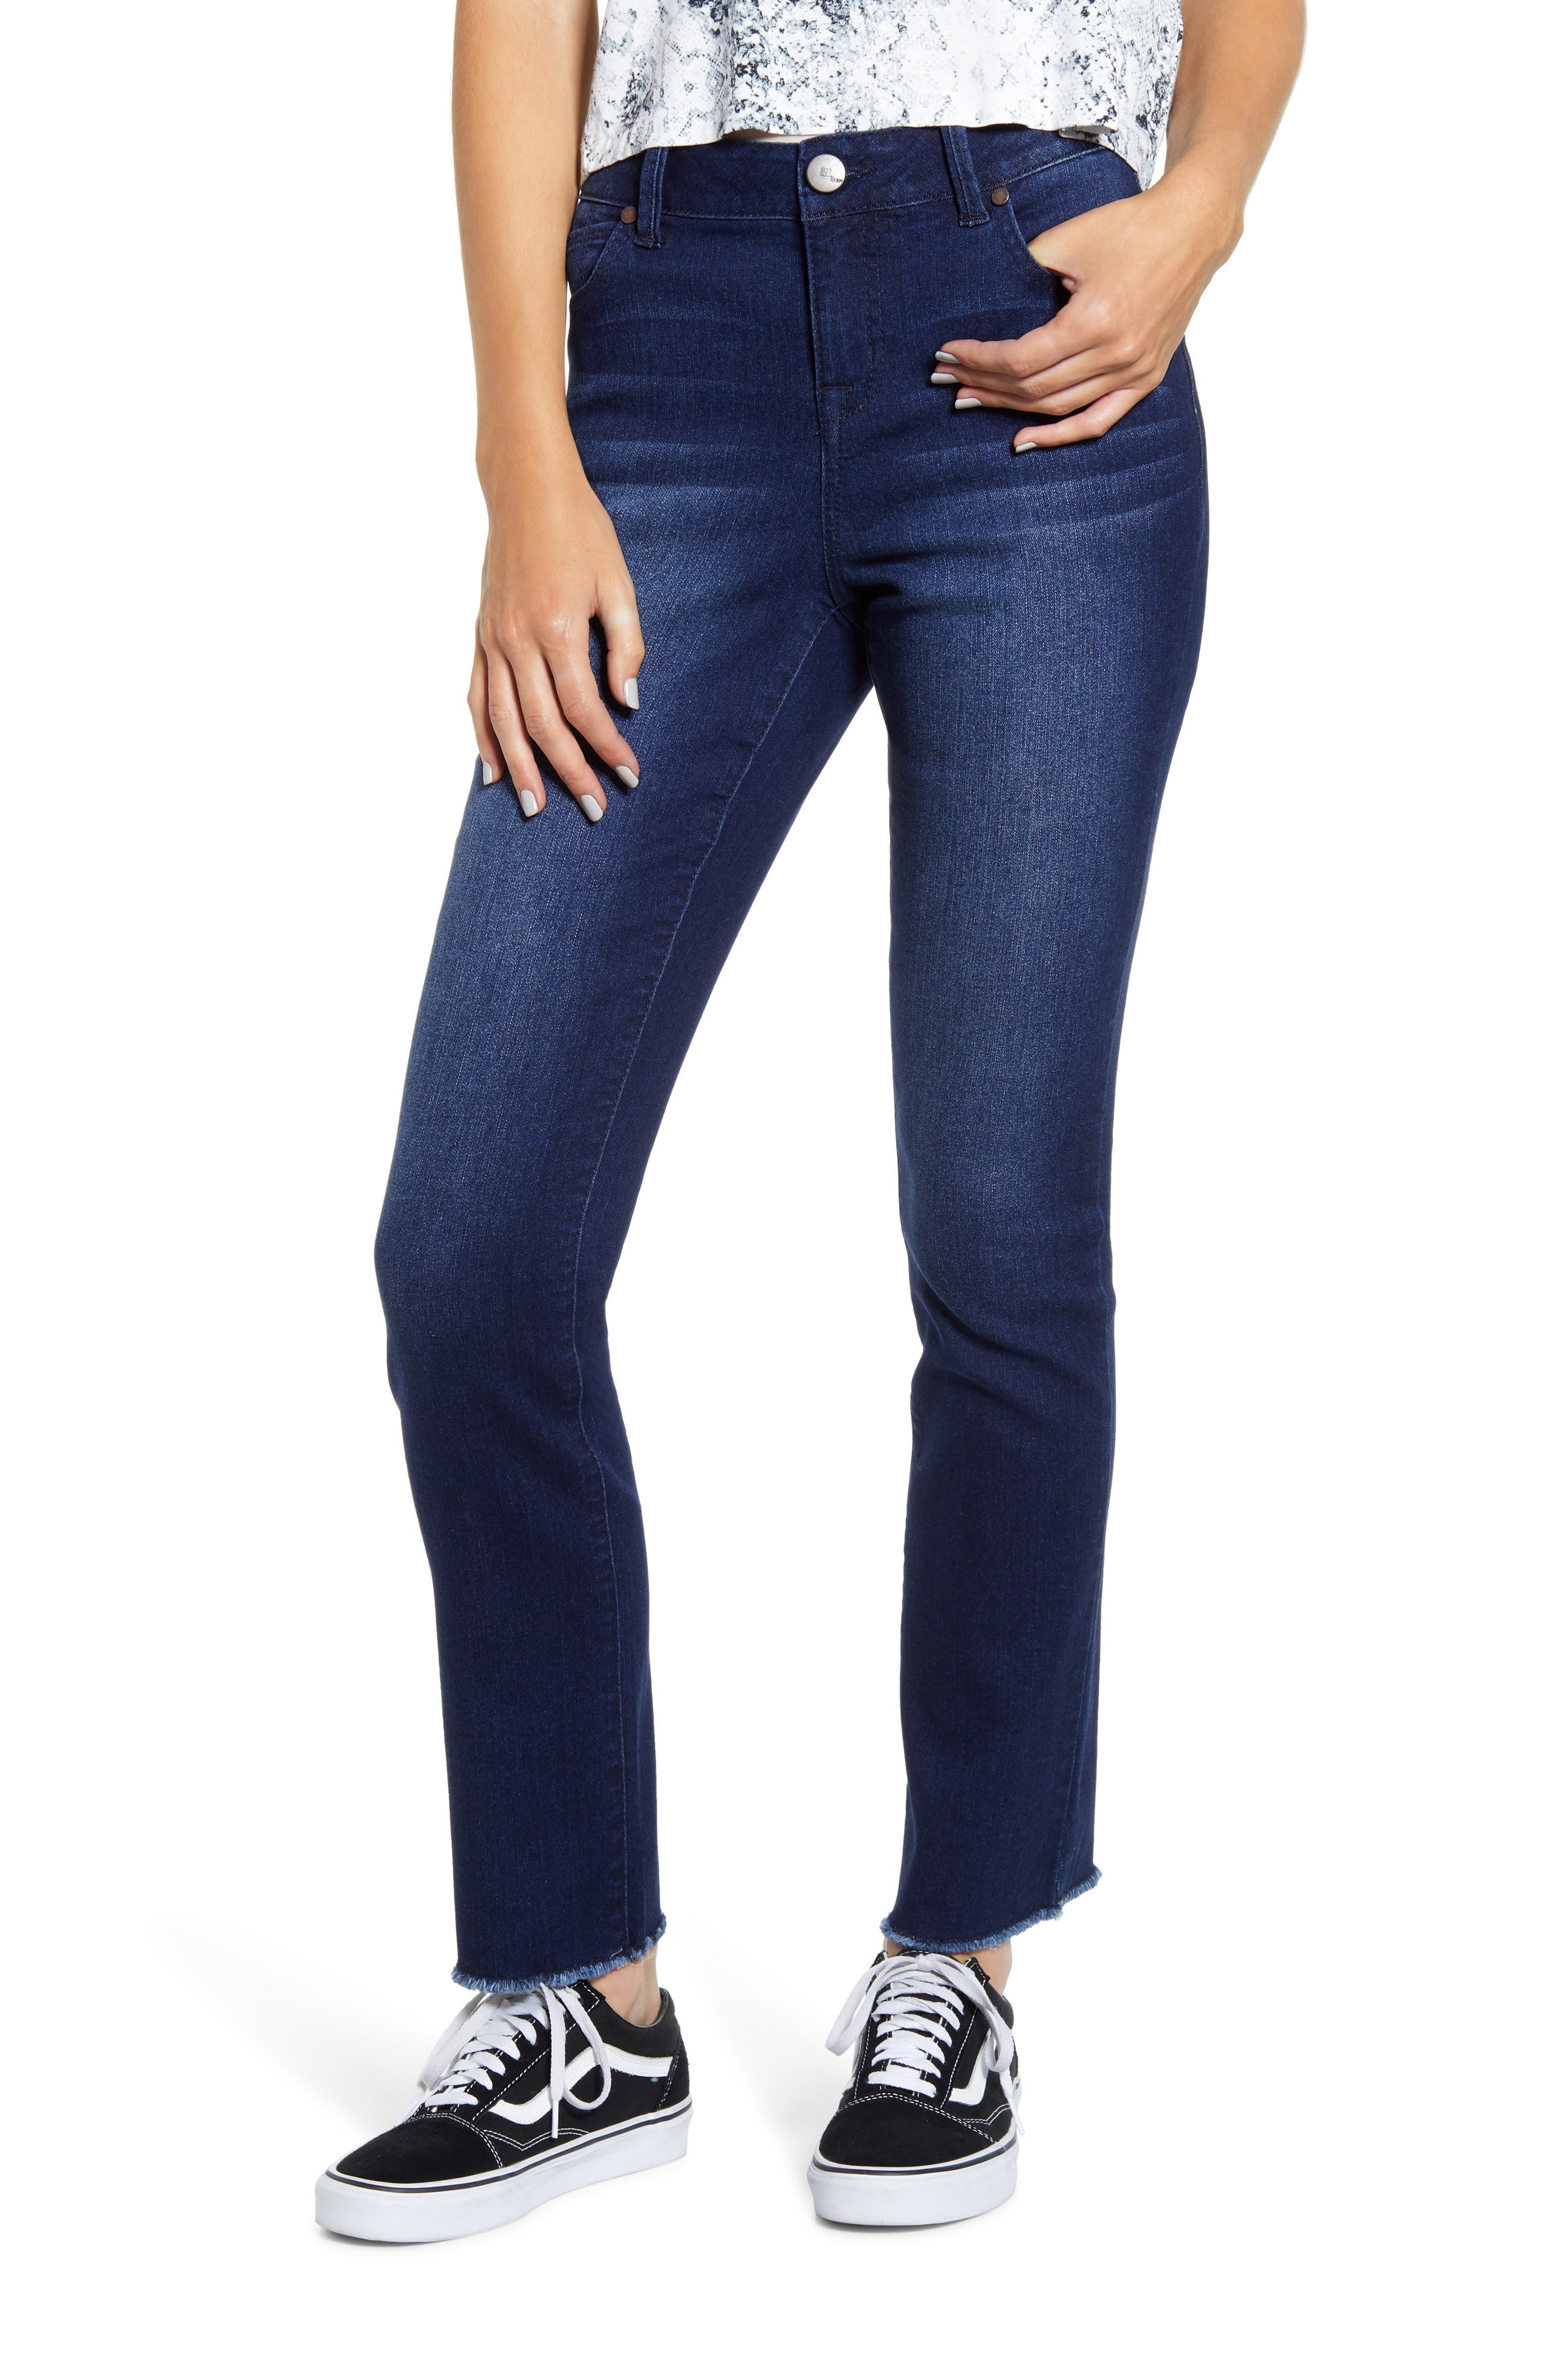 Women's 1822 Denim Re: denim High Waist Raw Hem Jeans,  24 - Blue